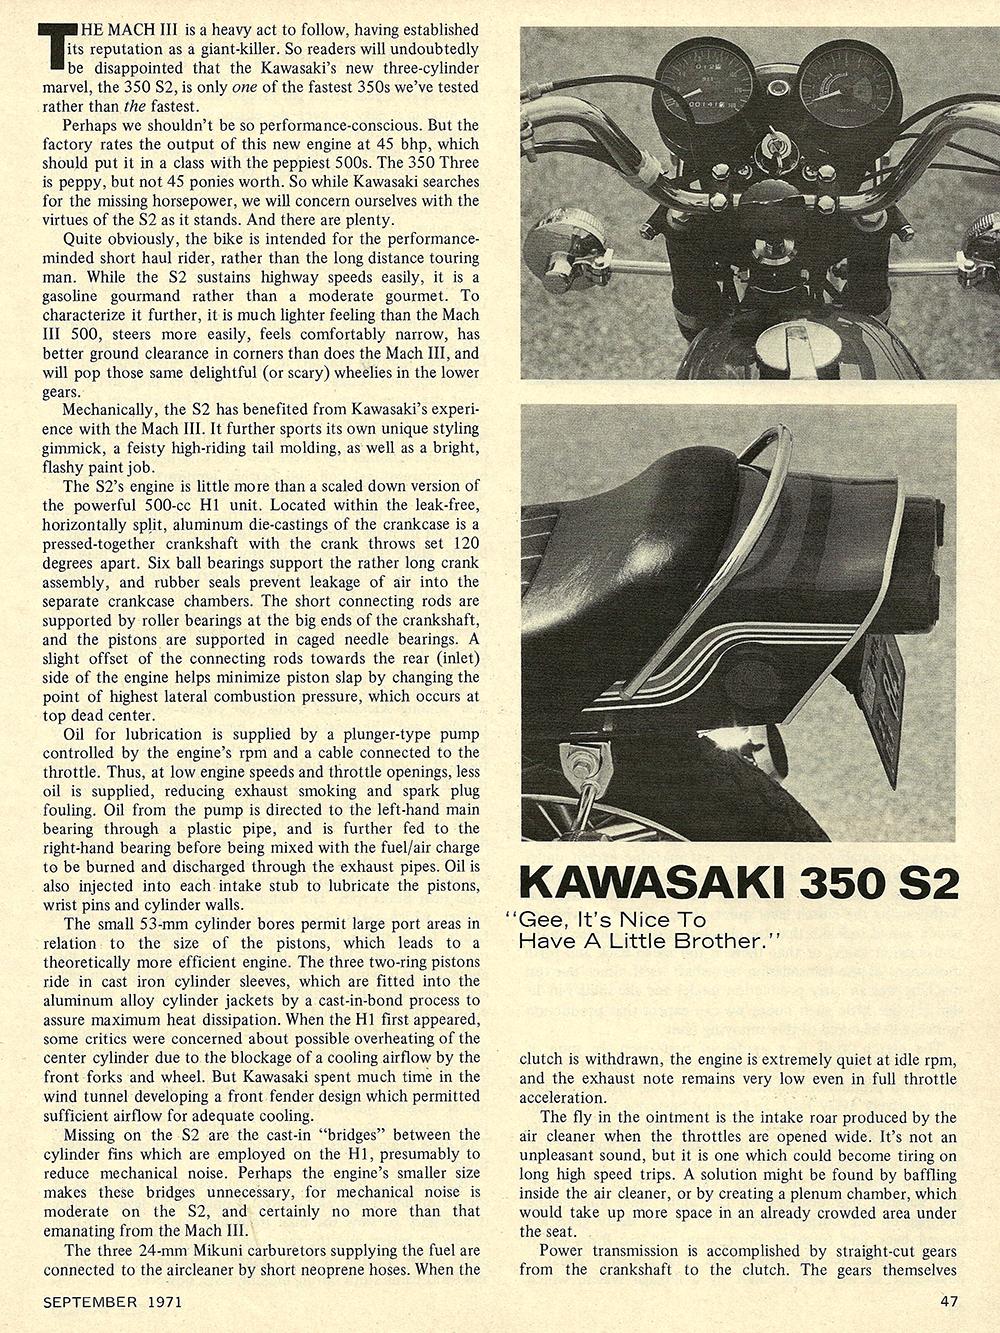 1971 Kawasaki 350 S2 road test 02.jpg